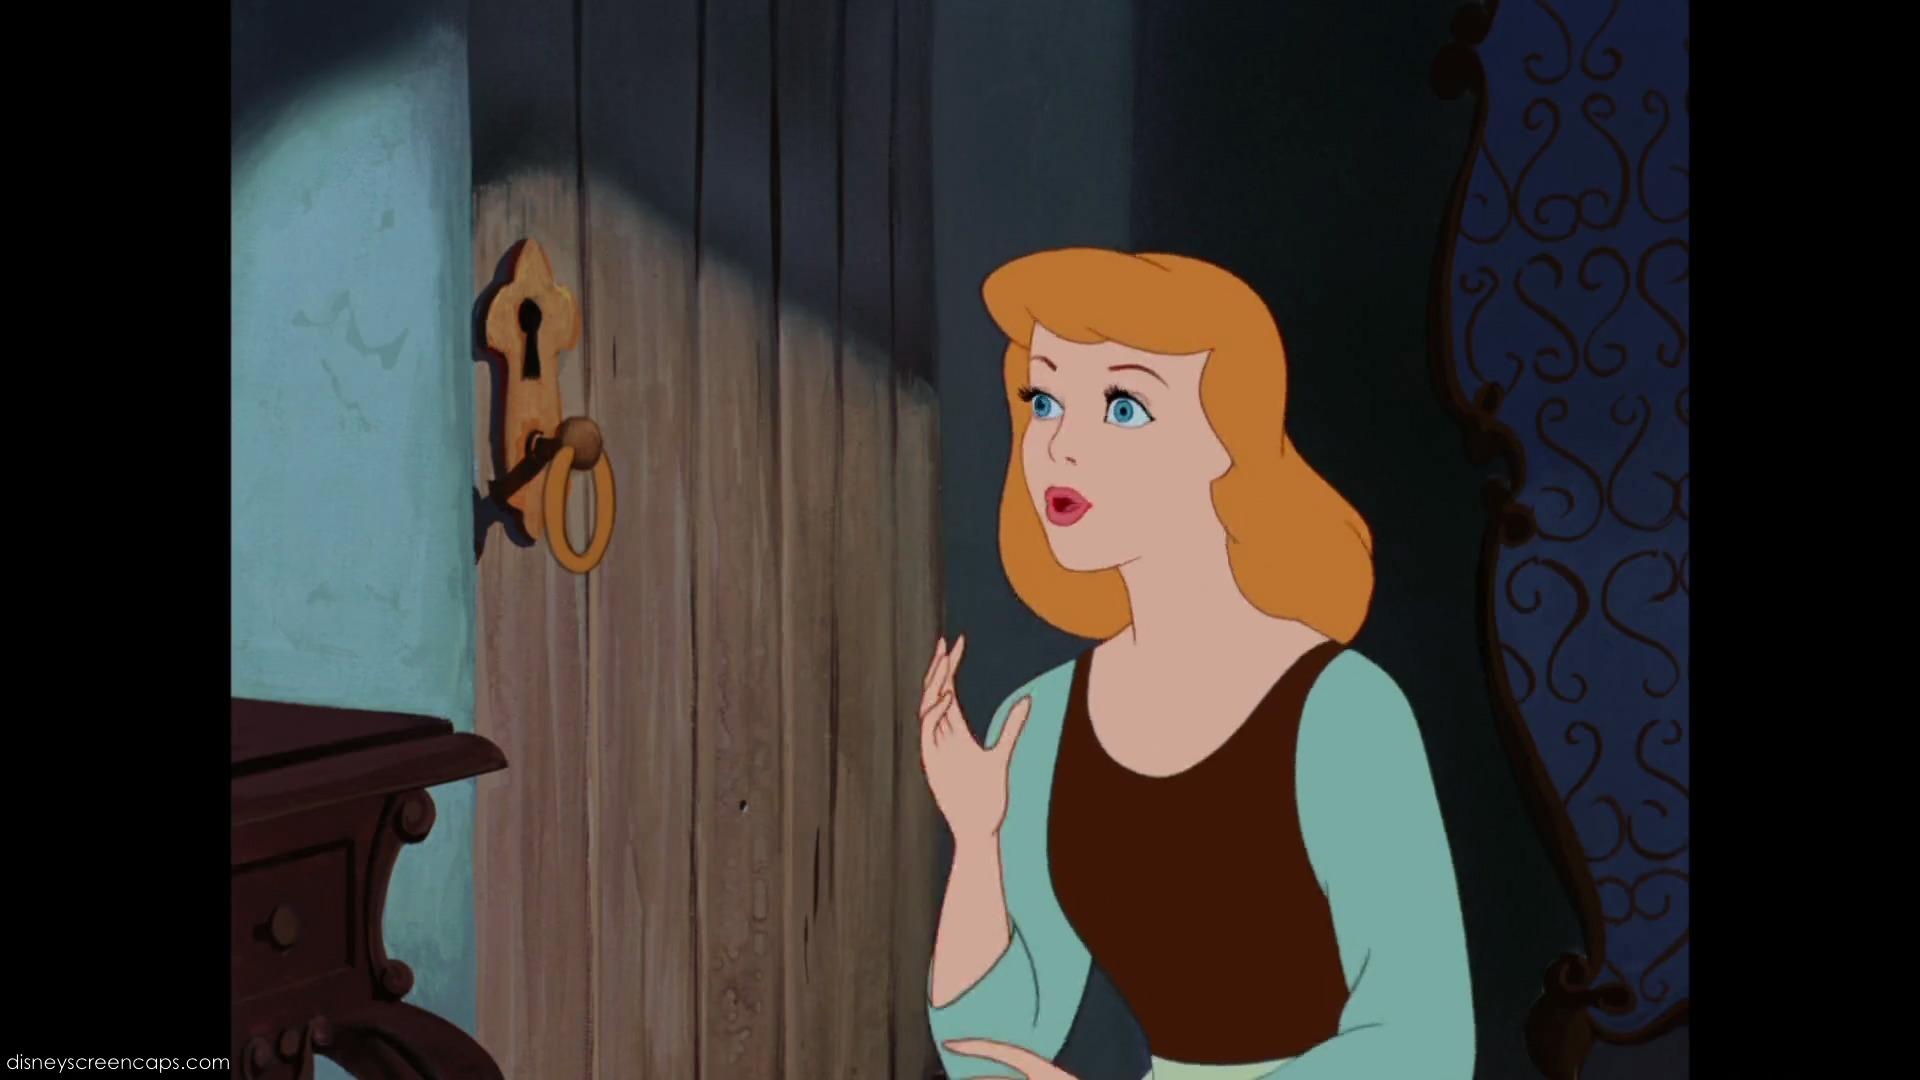 Cinderella Tumblr Gif